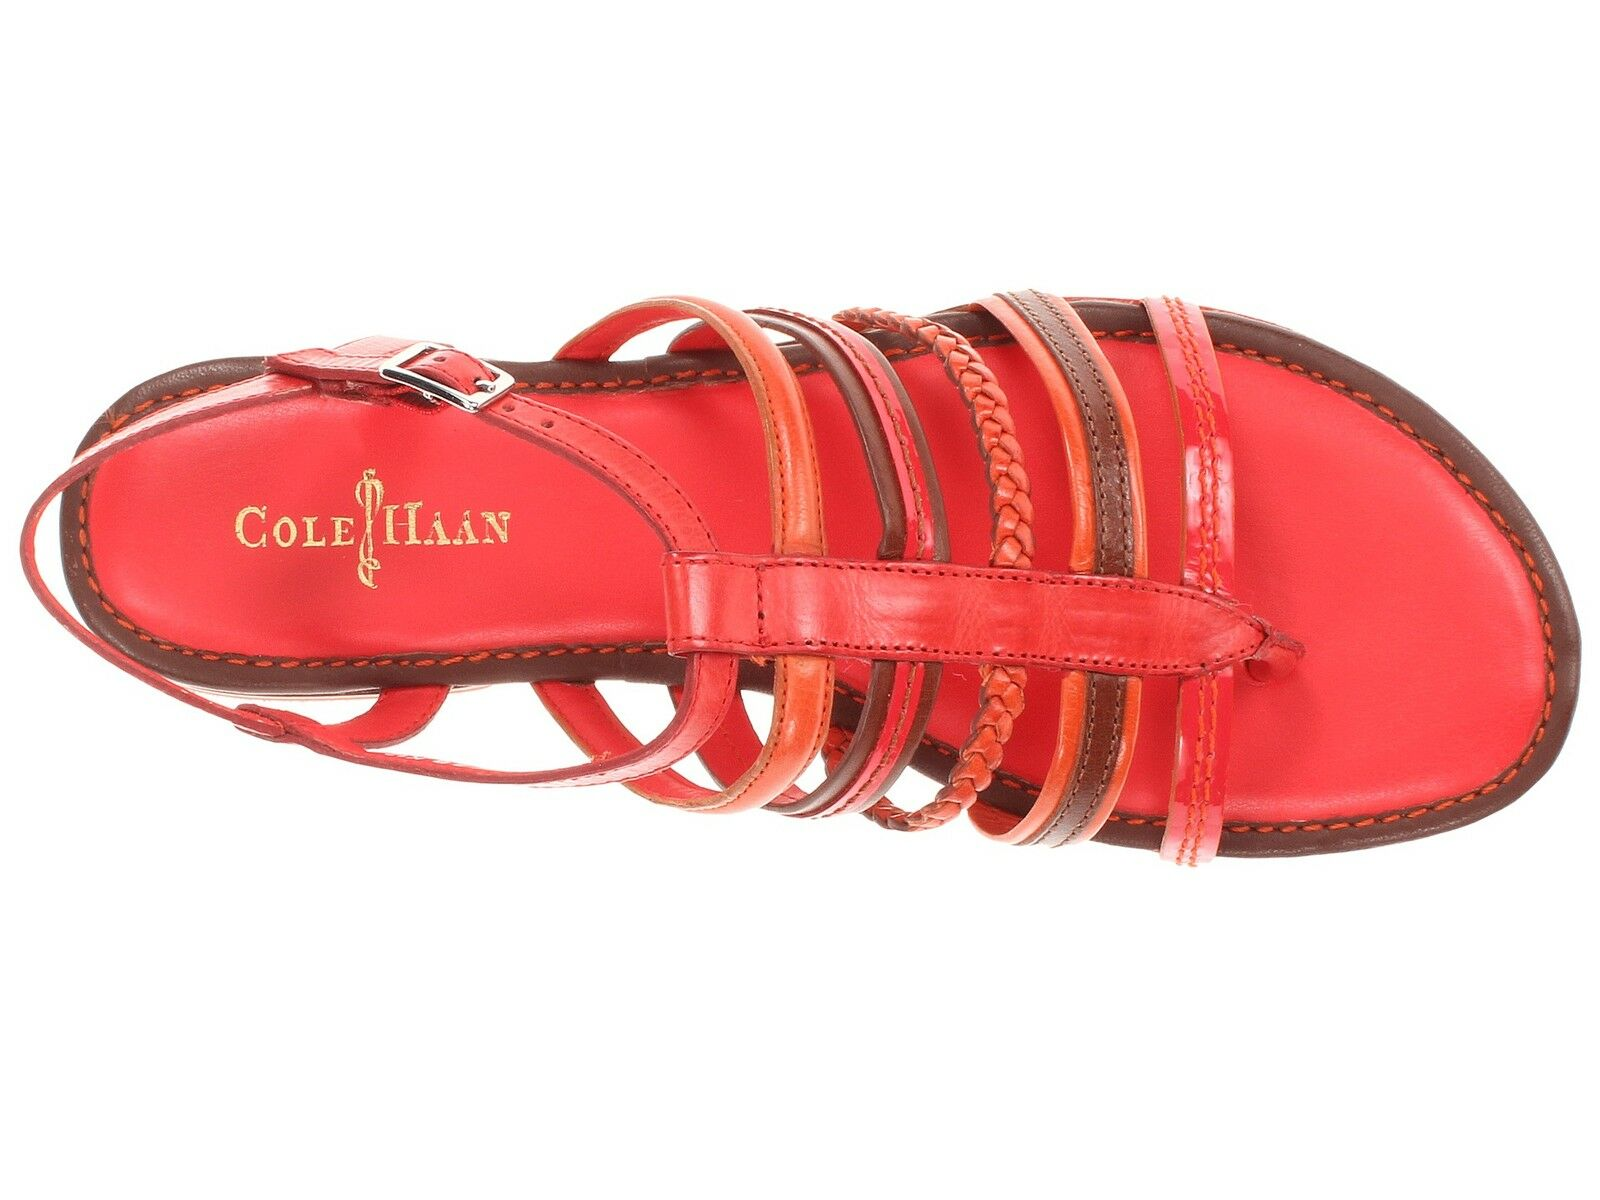 Cole Haan Nassau Nassau Nassau Flats Slingback Sandals Womens Cherry orange 7 NEW IN BOX 2d032f